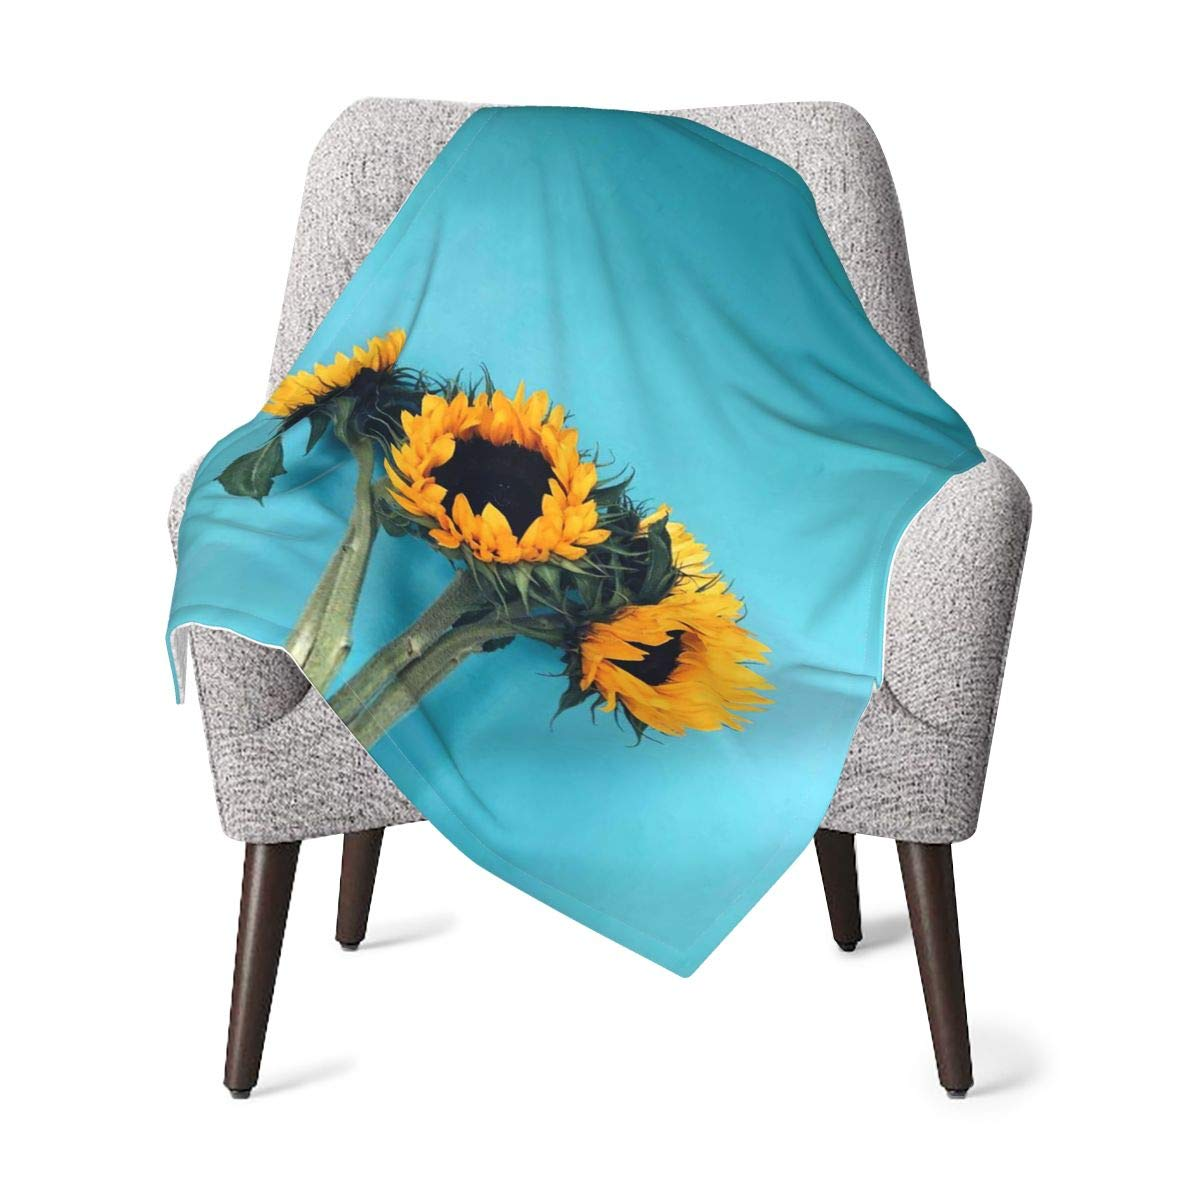 ASYOURWISH Baby Blanket Super Soft Plush, Sunflower Yellow Flower Printed Unisex Design Received Blanket, Nursery, Stroller Infant & Toddler Bedding 30x40 Inch